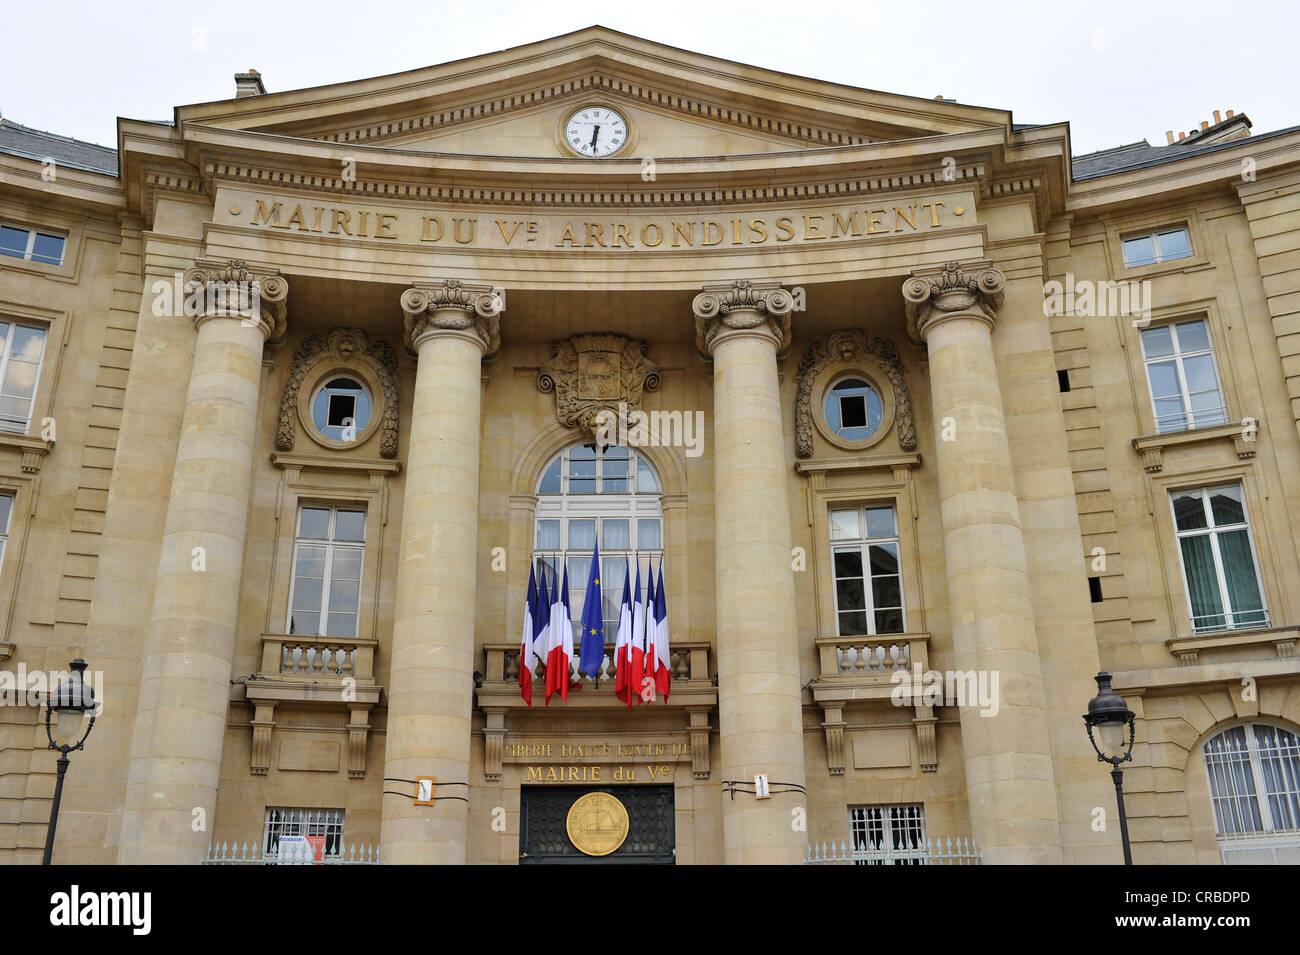 Mayor's office of the 5th Arrondissement, Montagne Sainte-Genevieve, Paris, France, Europe, PublicGround - Stock Image